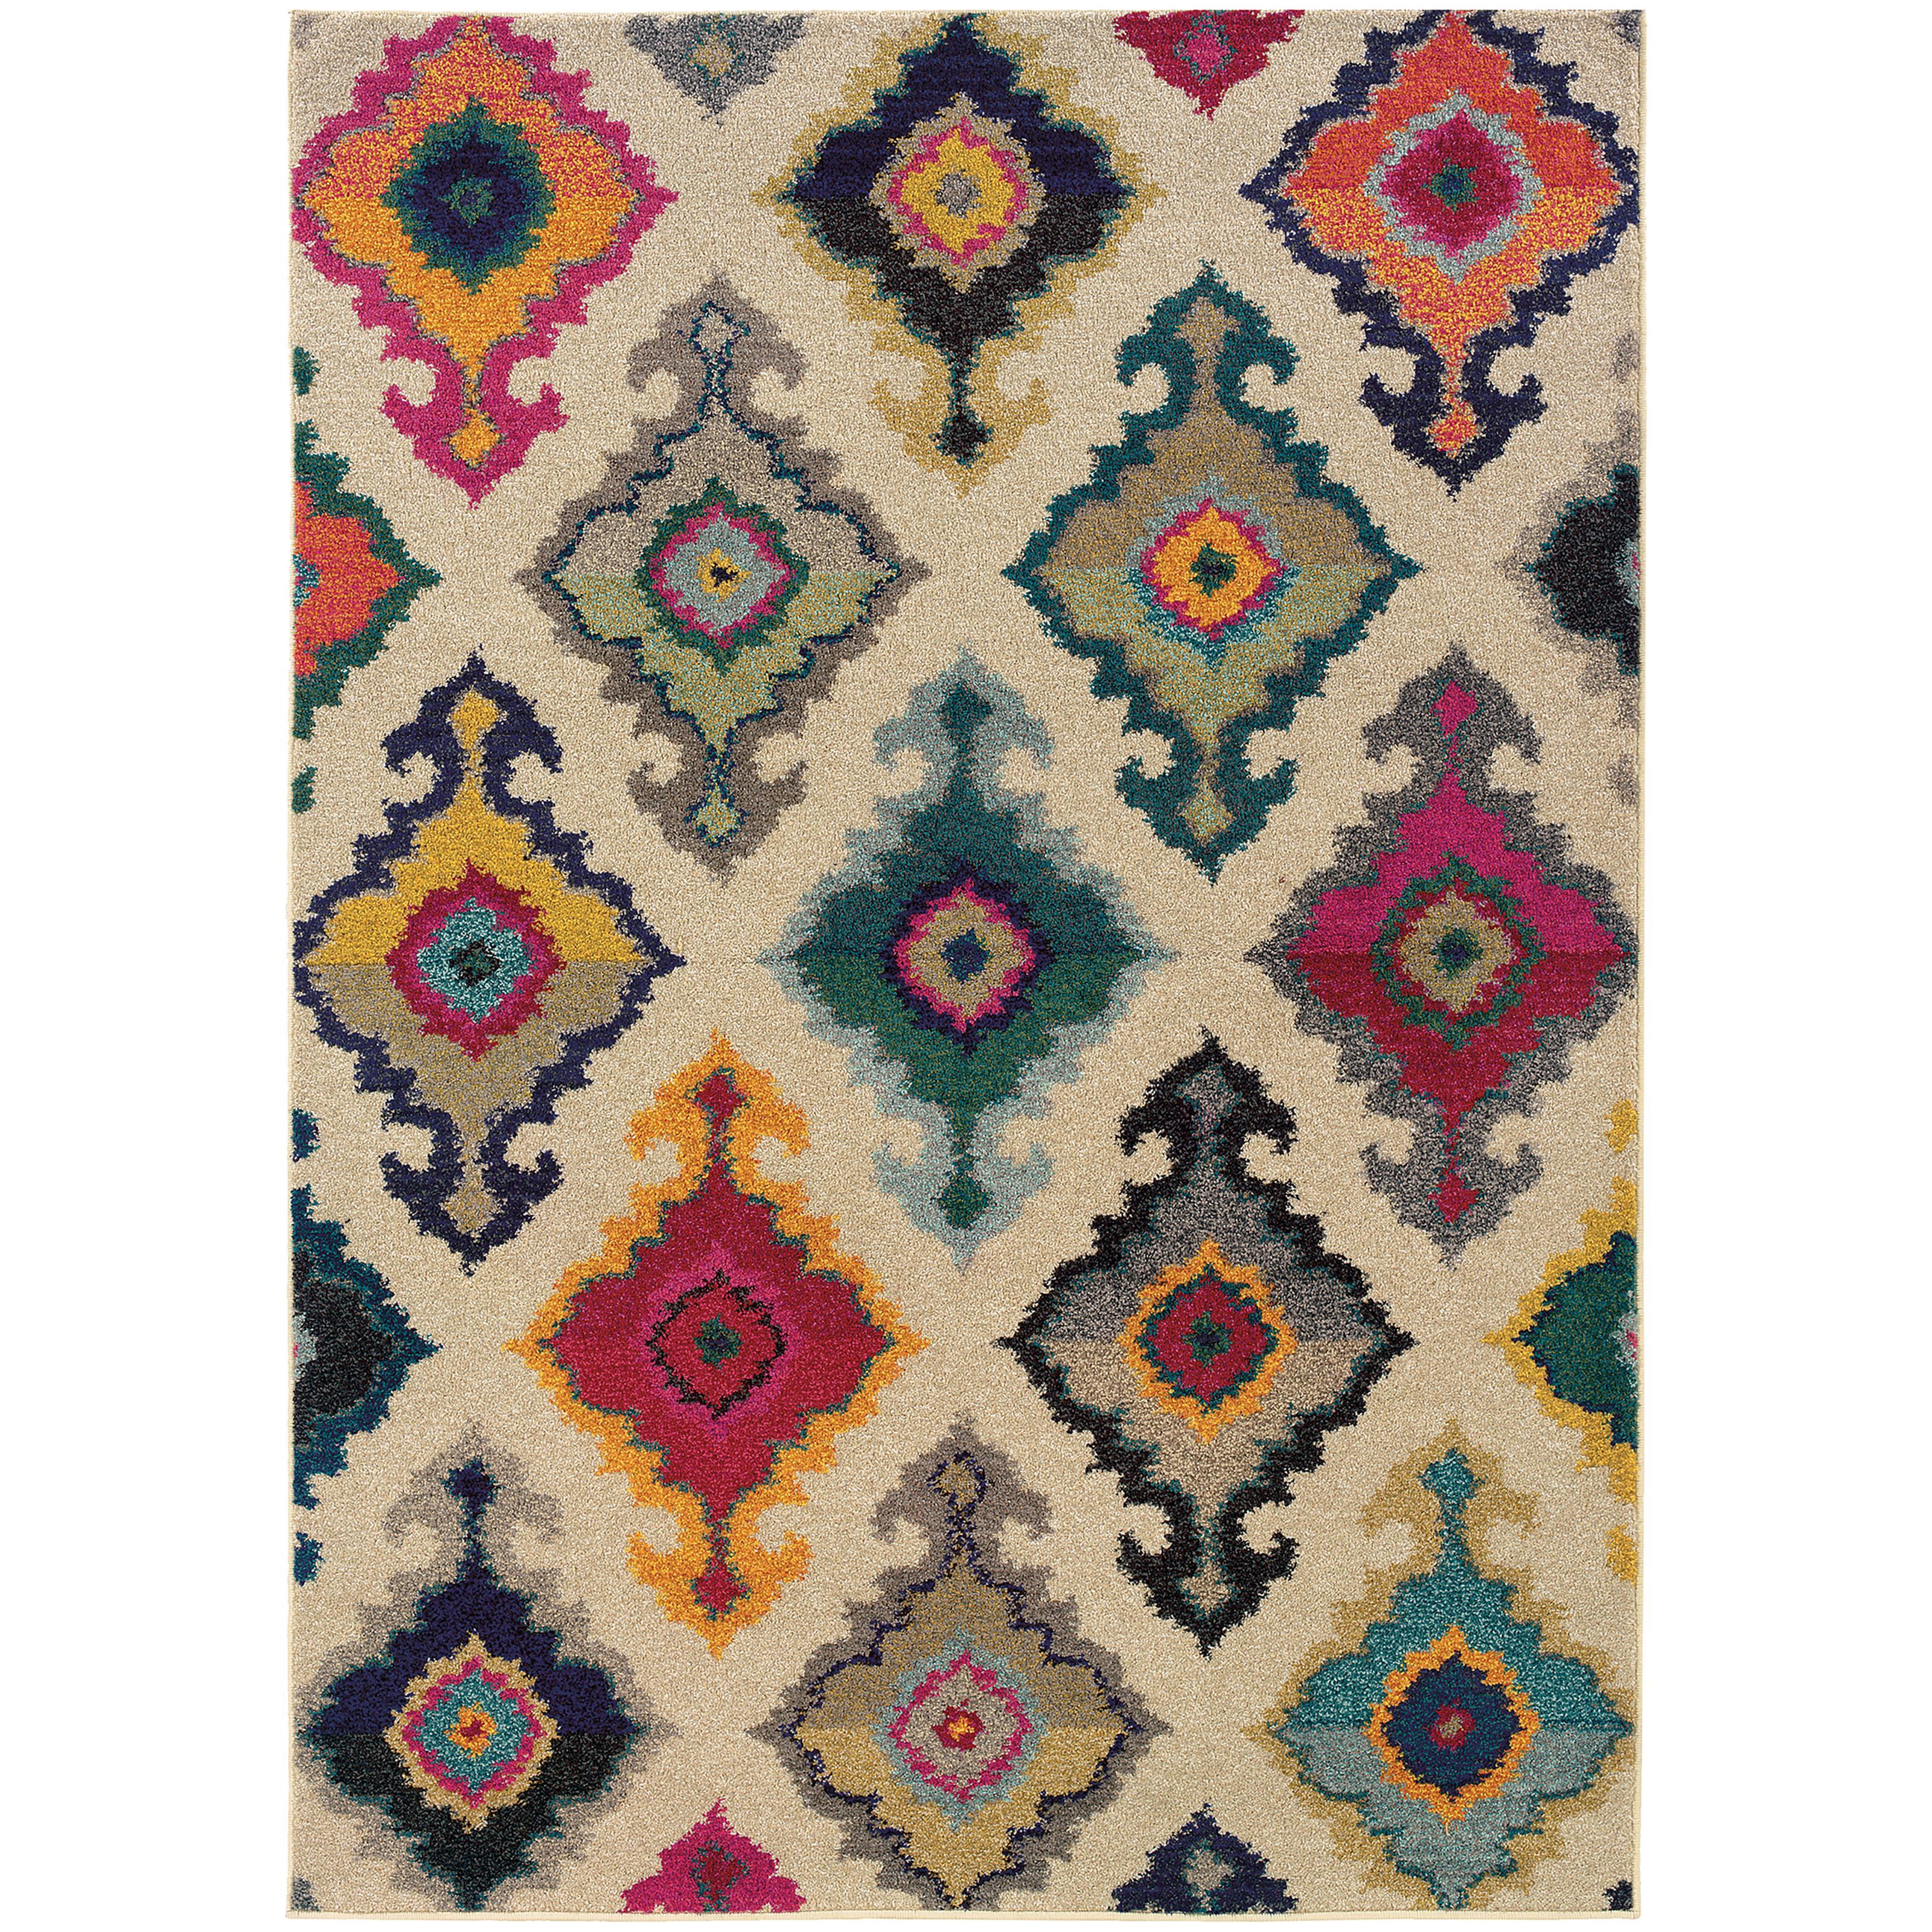 "Kaleidoscope 7'10"" X 10'10"" Rug by Oriental Weavers at Steger's Furniture"